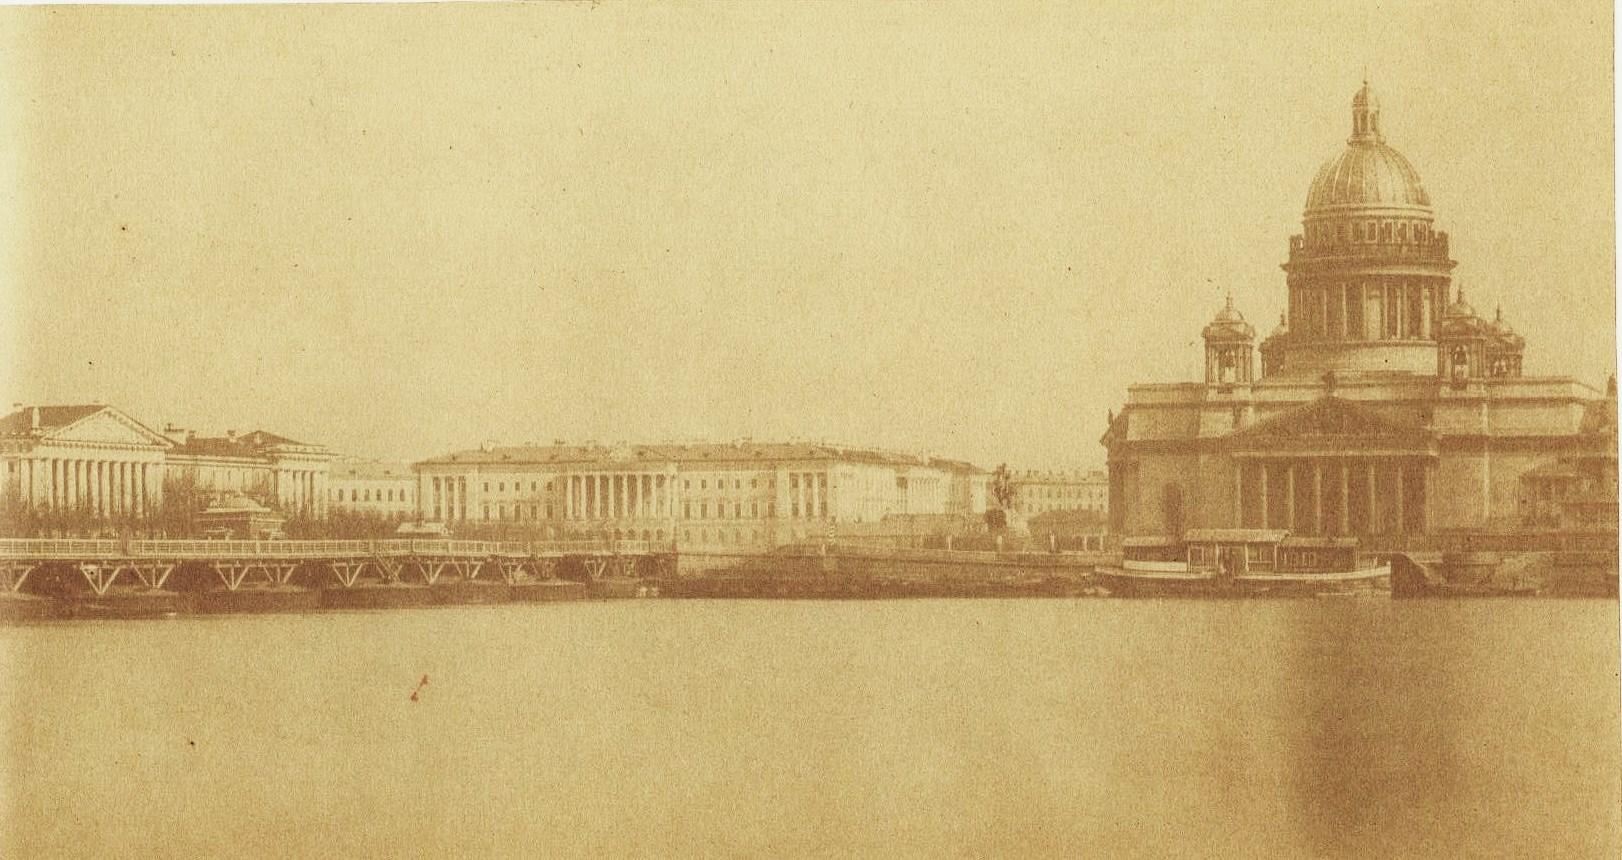 1852. Вид на Сенатскую площадь